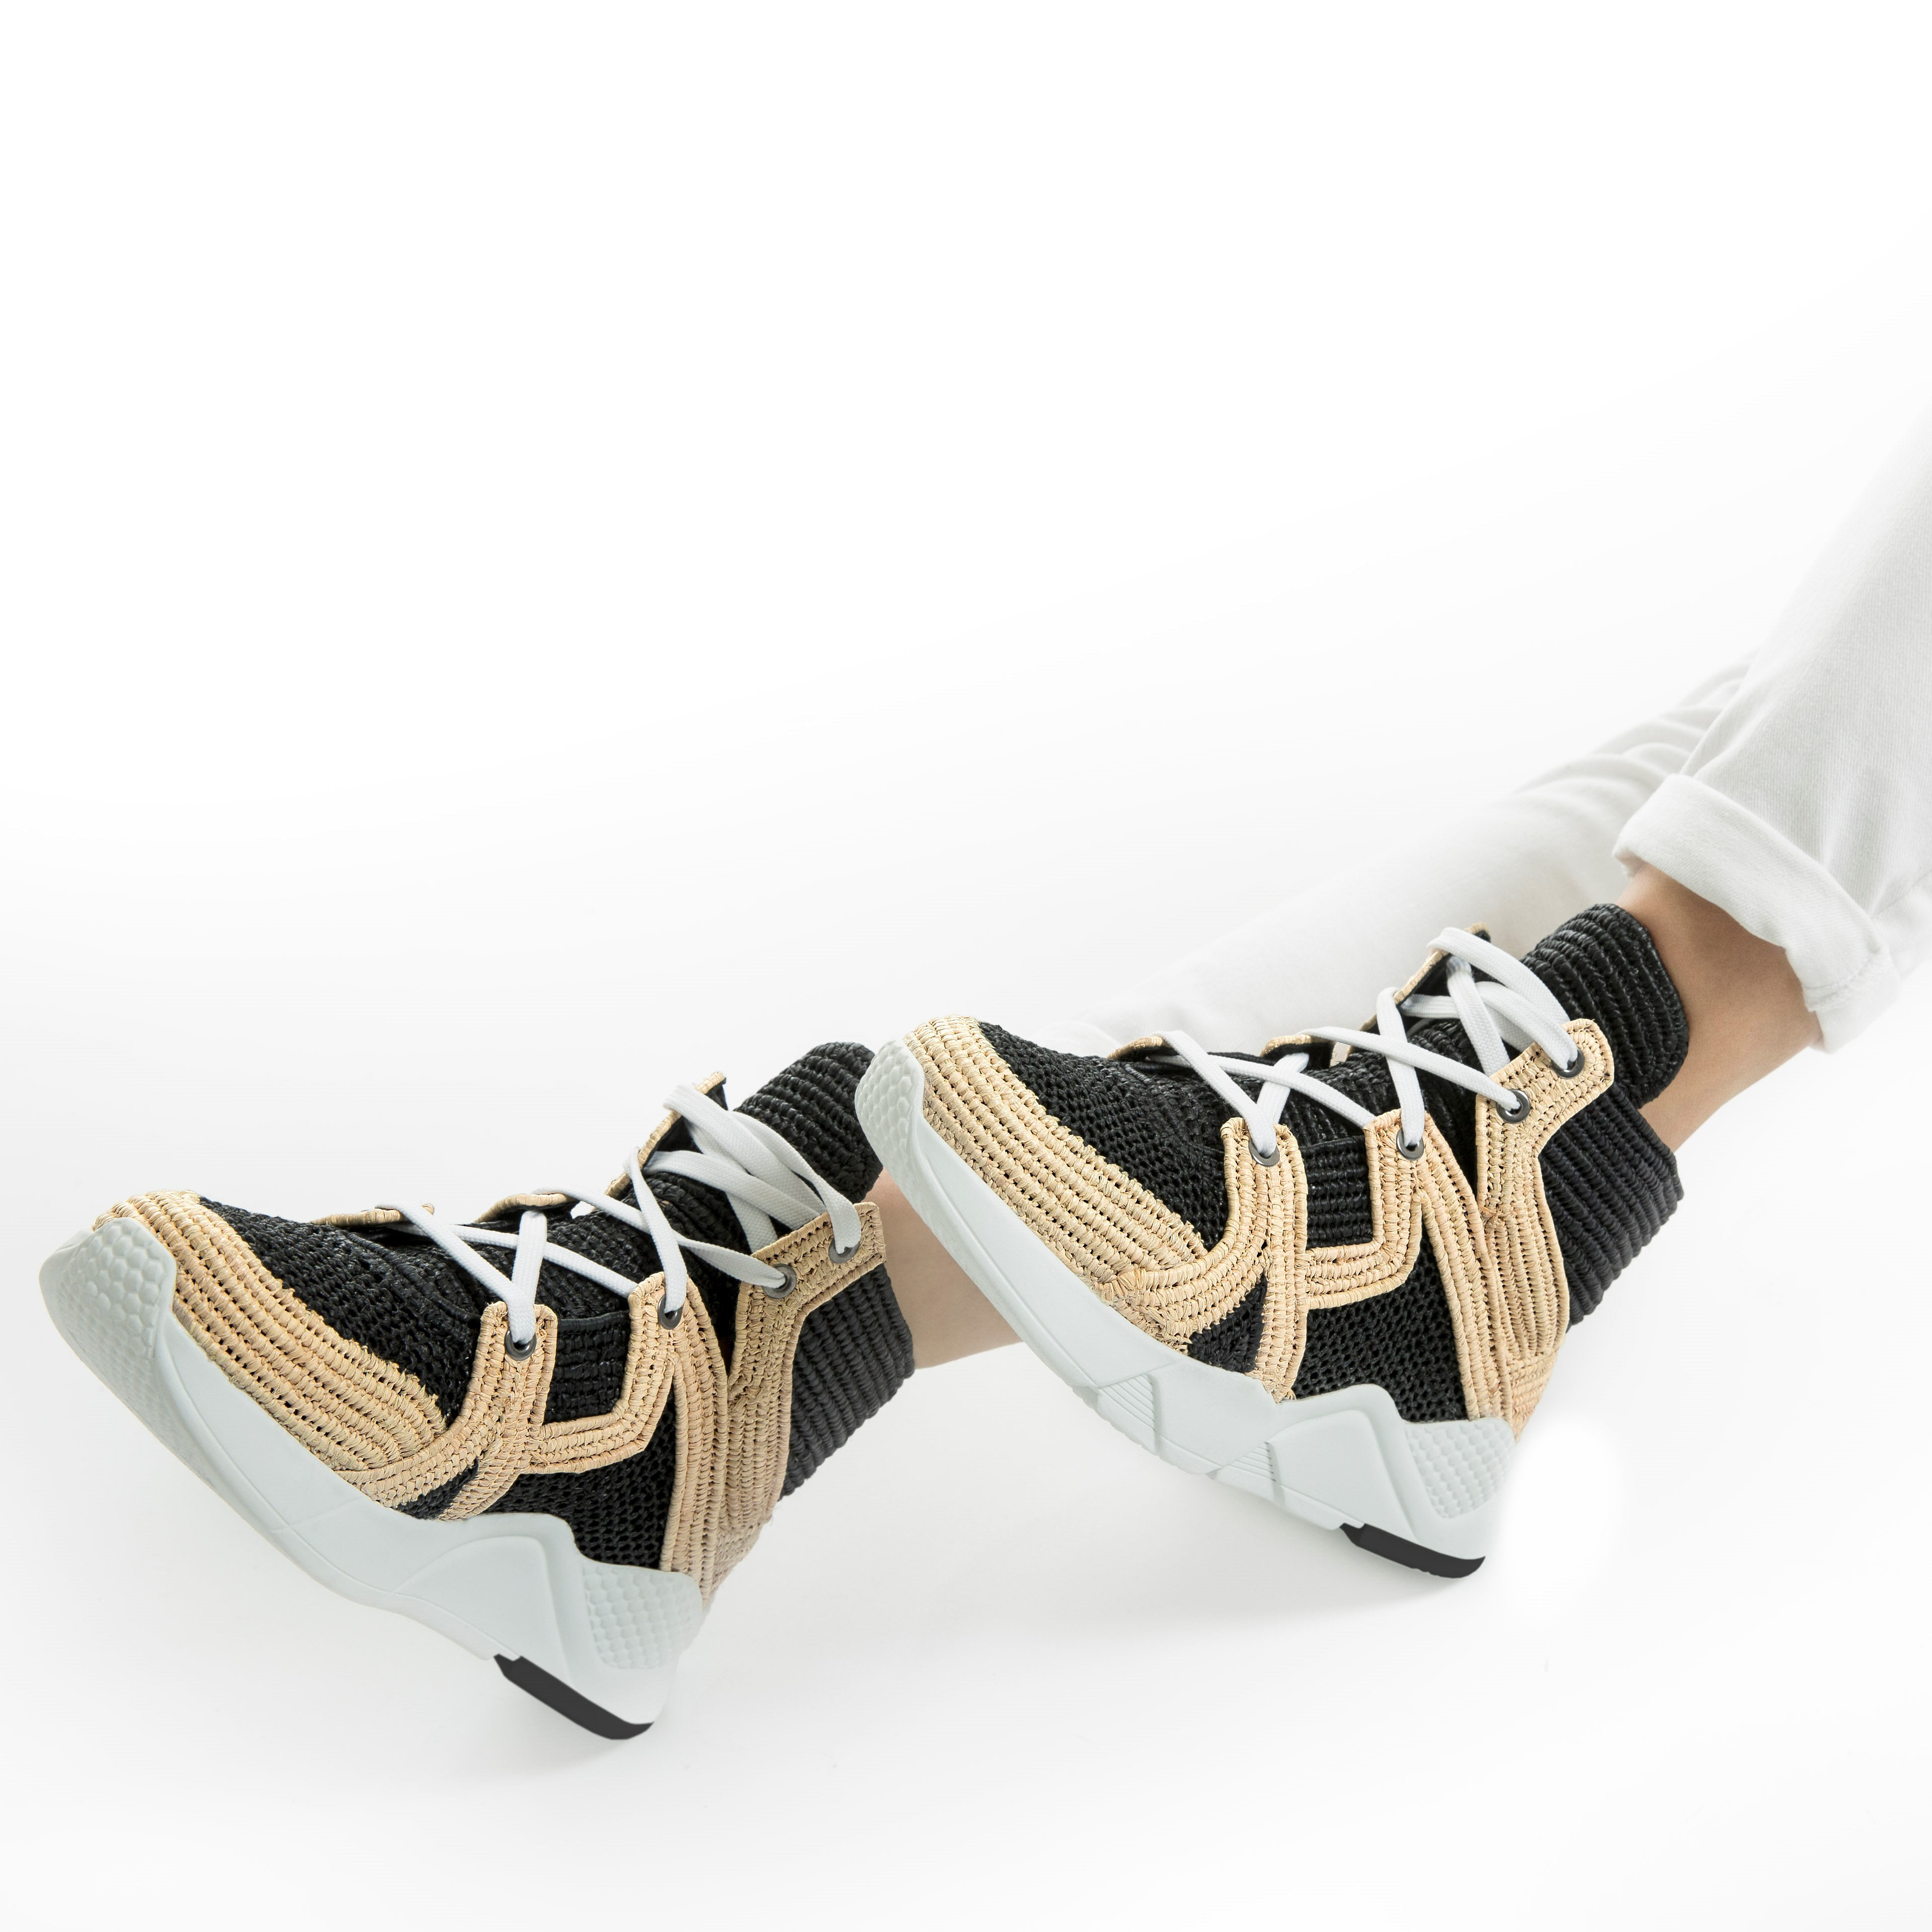 The exclusive Clergerie raffia sneaker.